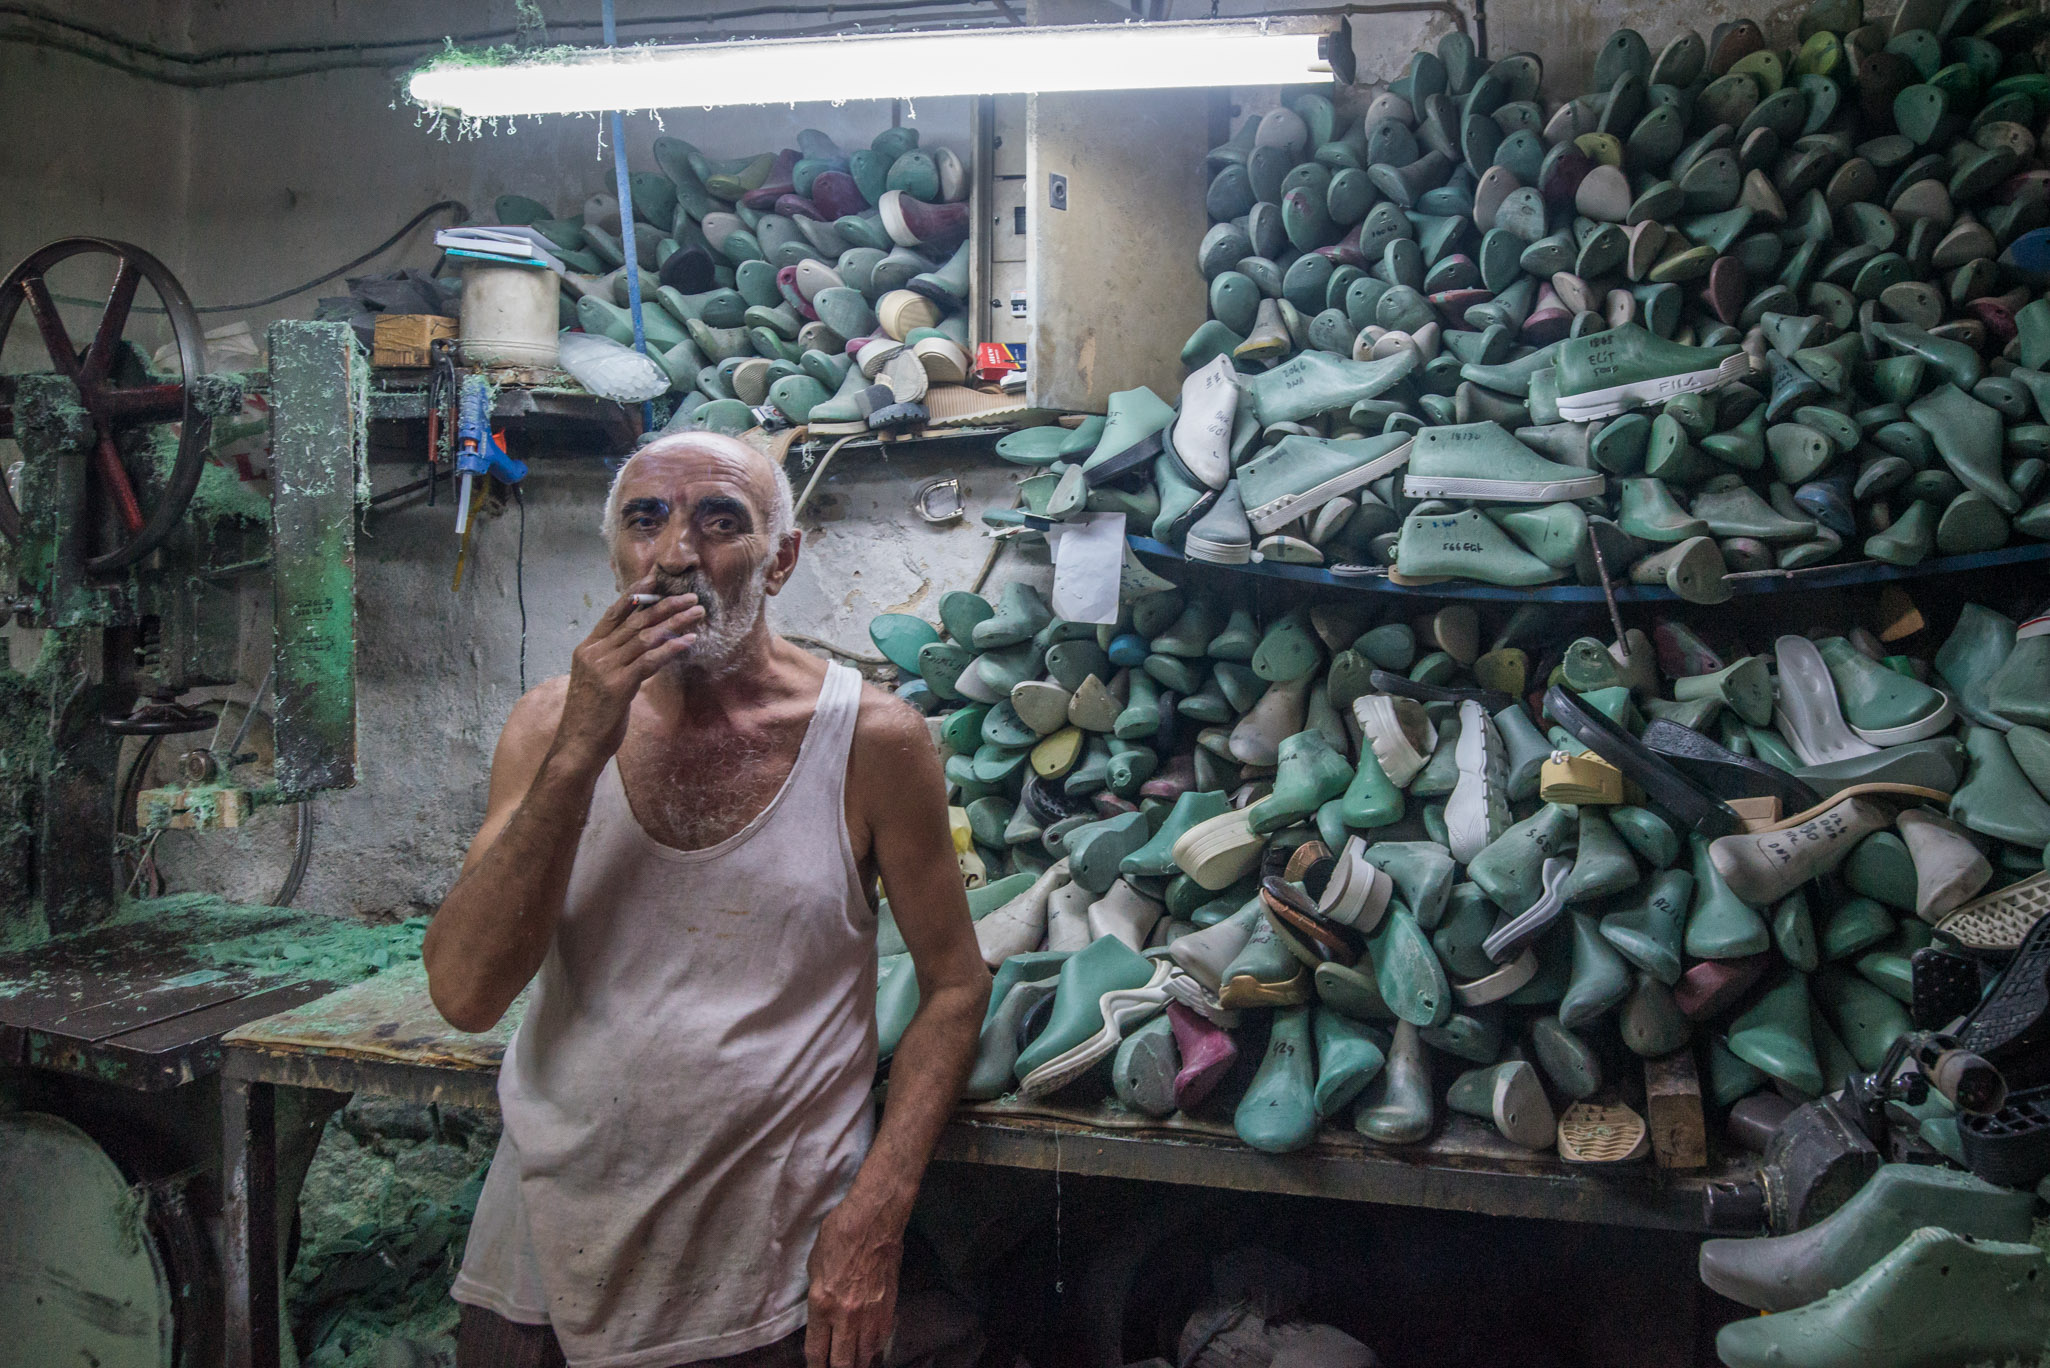 Clinton Logan - An Armenian man takes a quick cigarette break in the subterranean sweatshops of Istanbul.